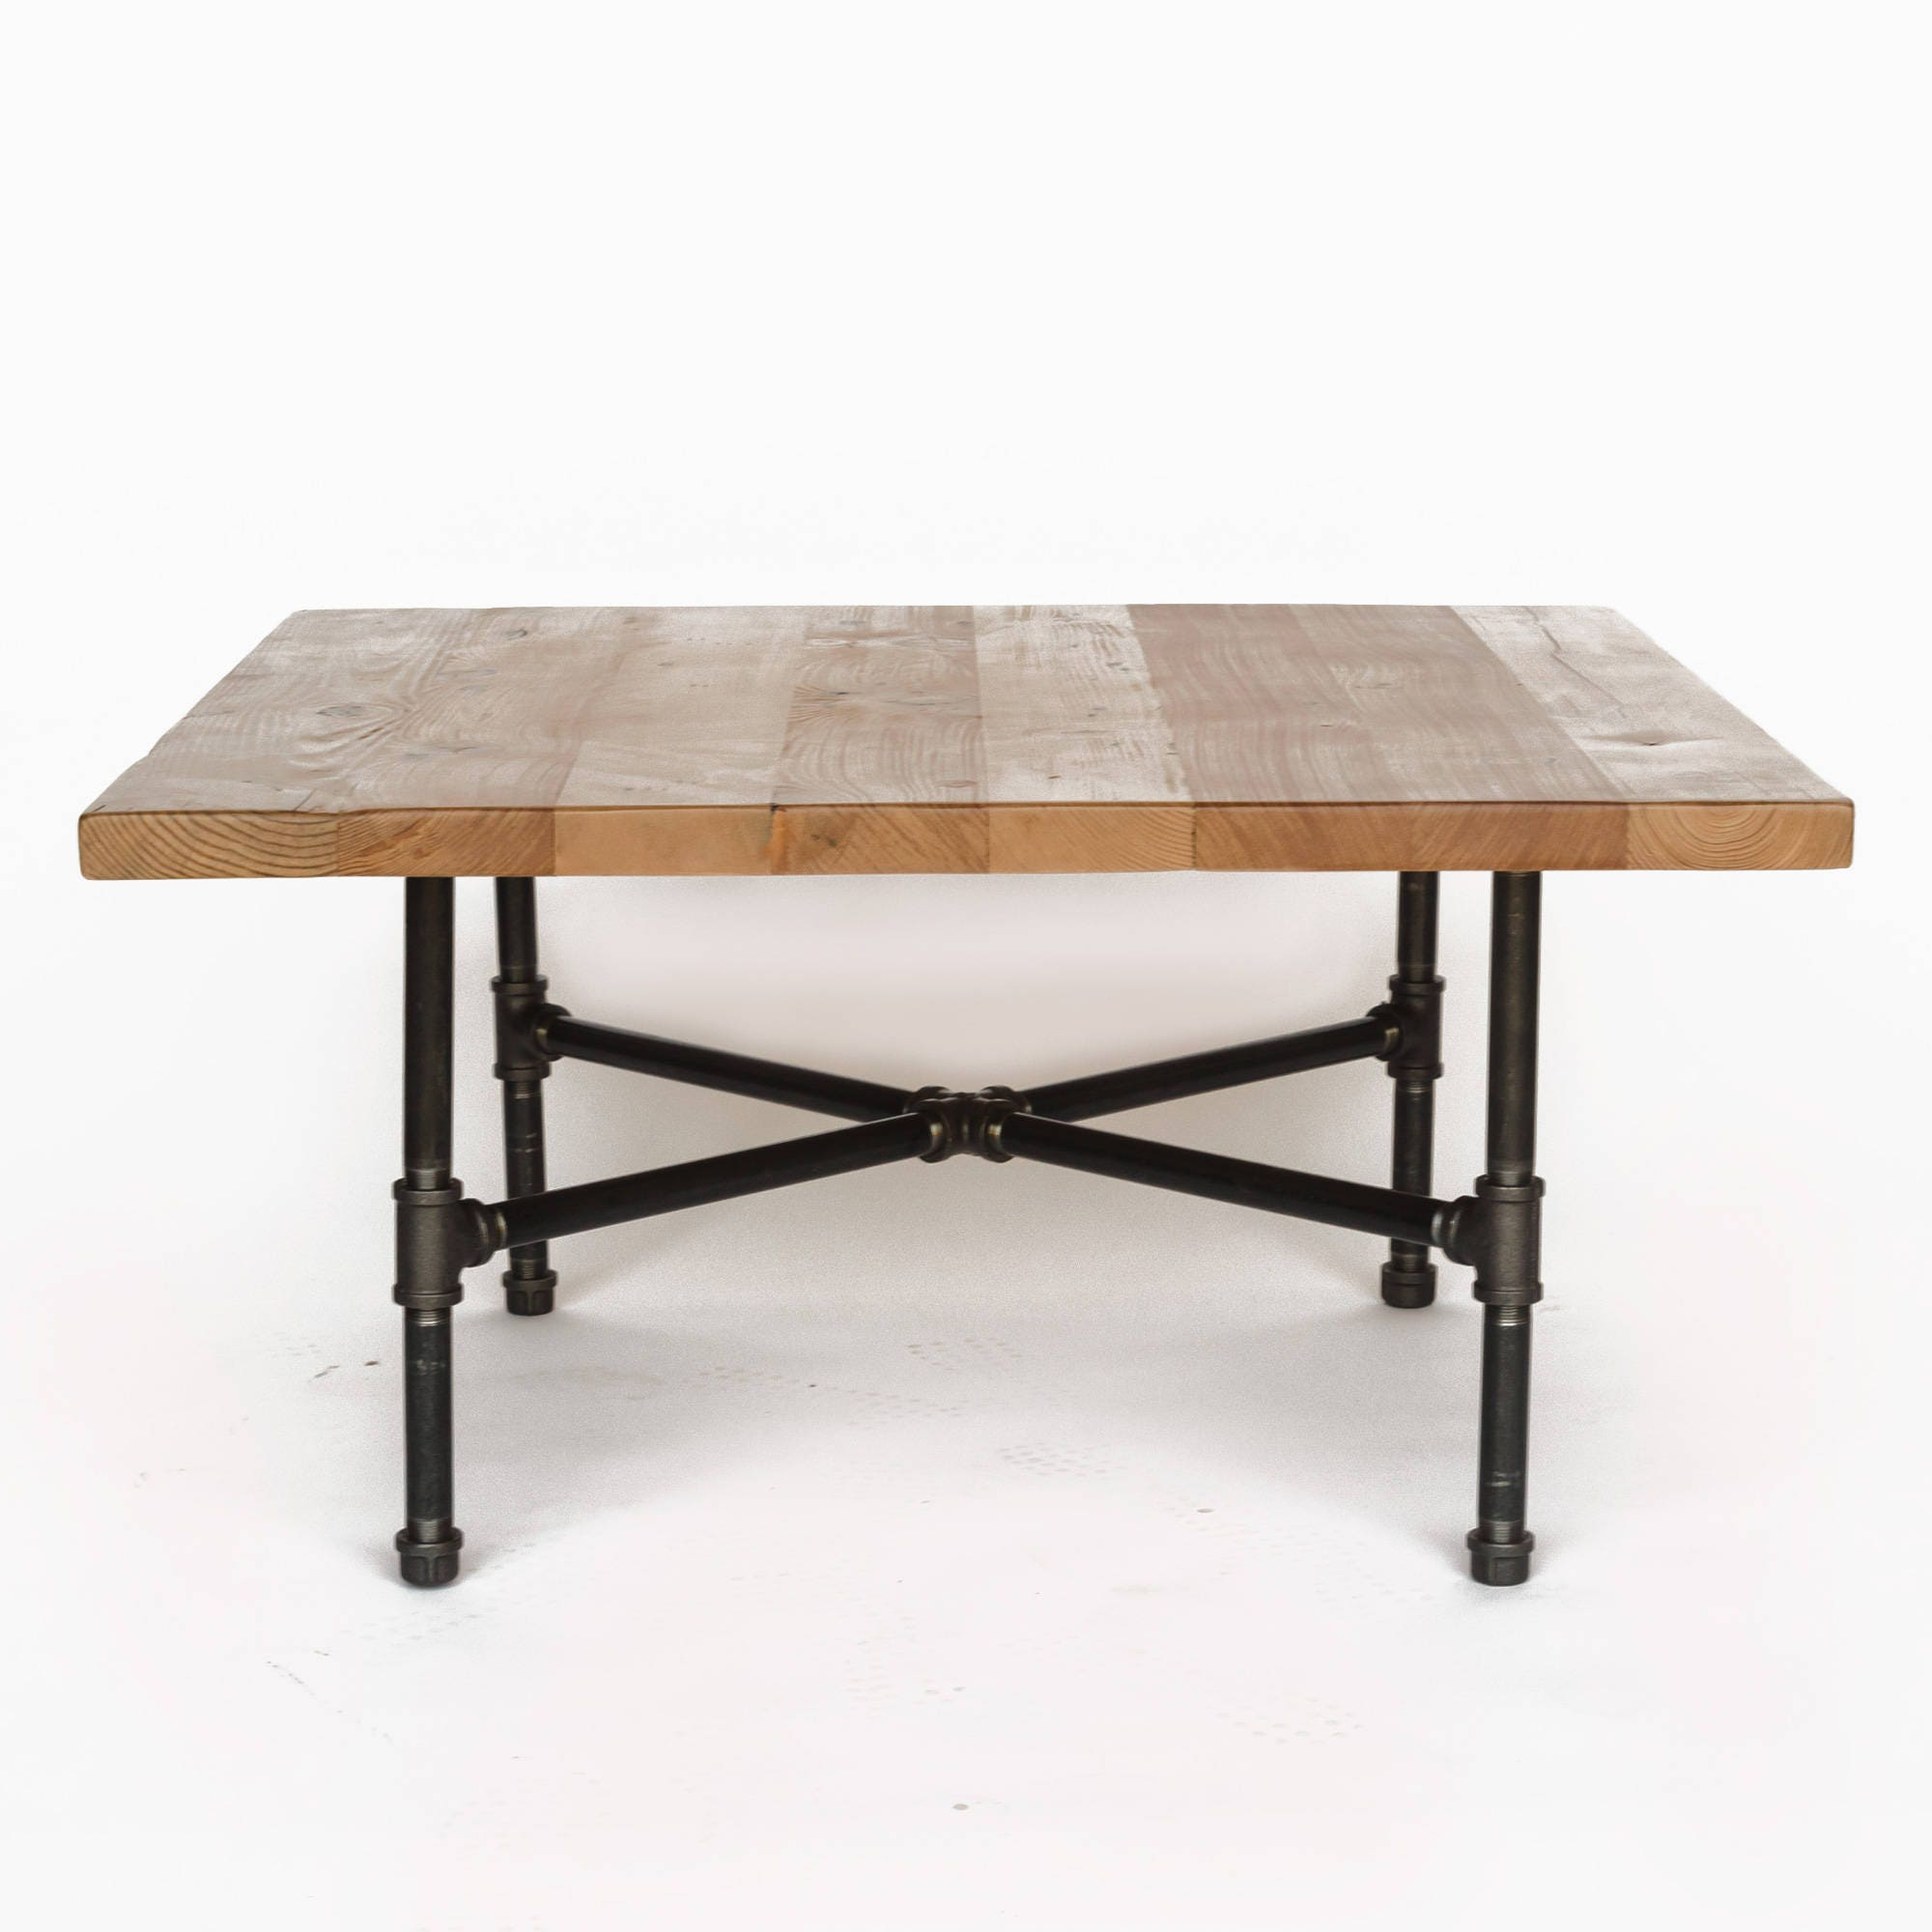 Reclaimed Wood Coffee Table Stainless Steel Legs: Wood Coffee Table With Steel Pipe Legs Made Of Reclaimed Wood